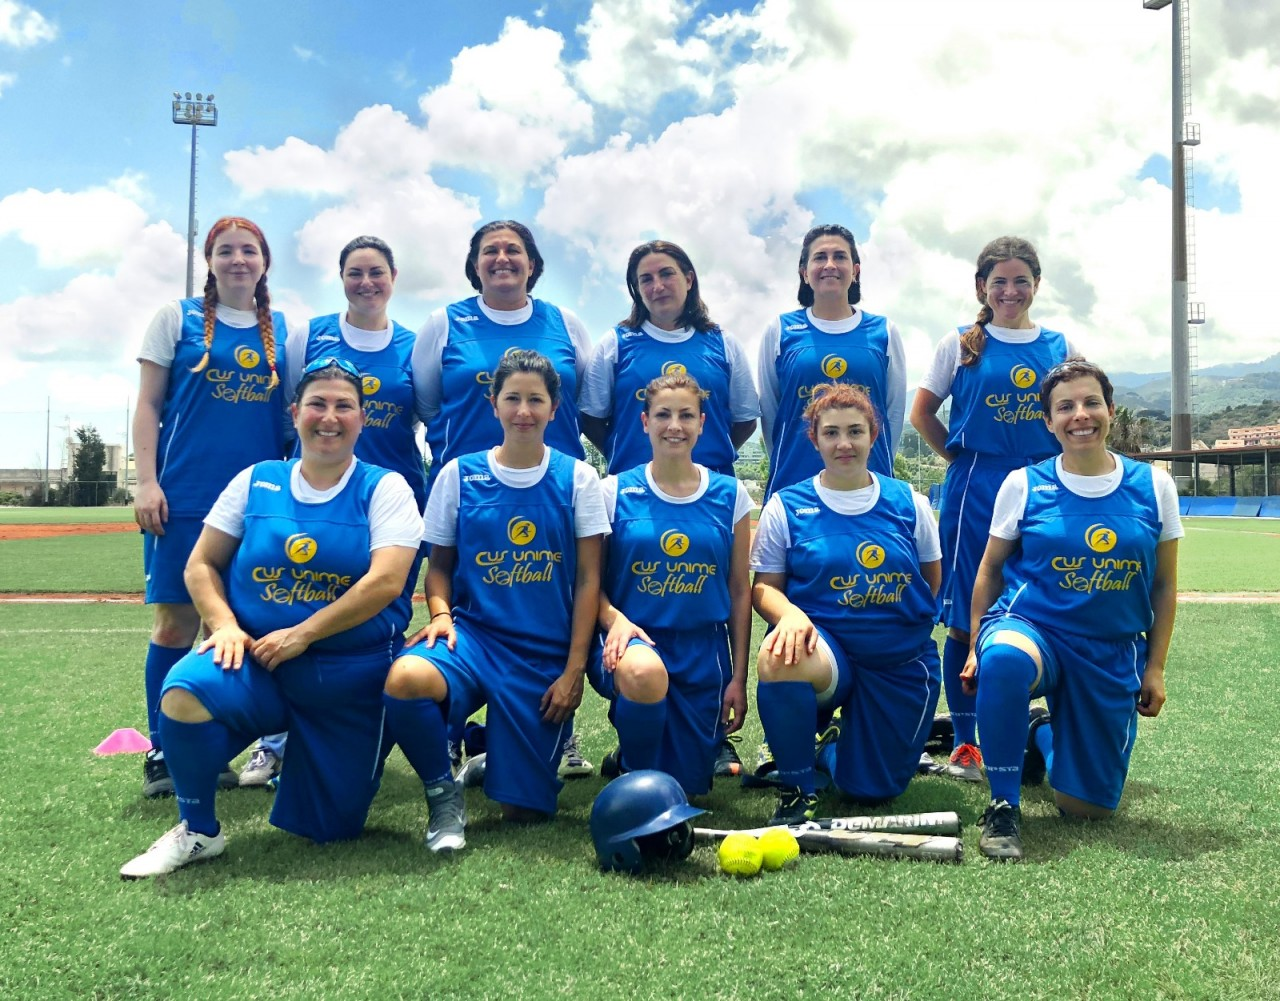 Le ragazze del CUS Unime softball